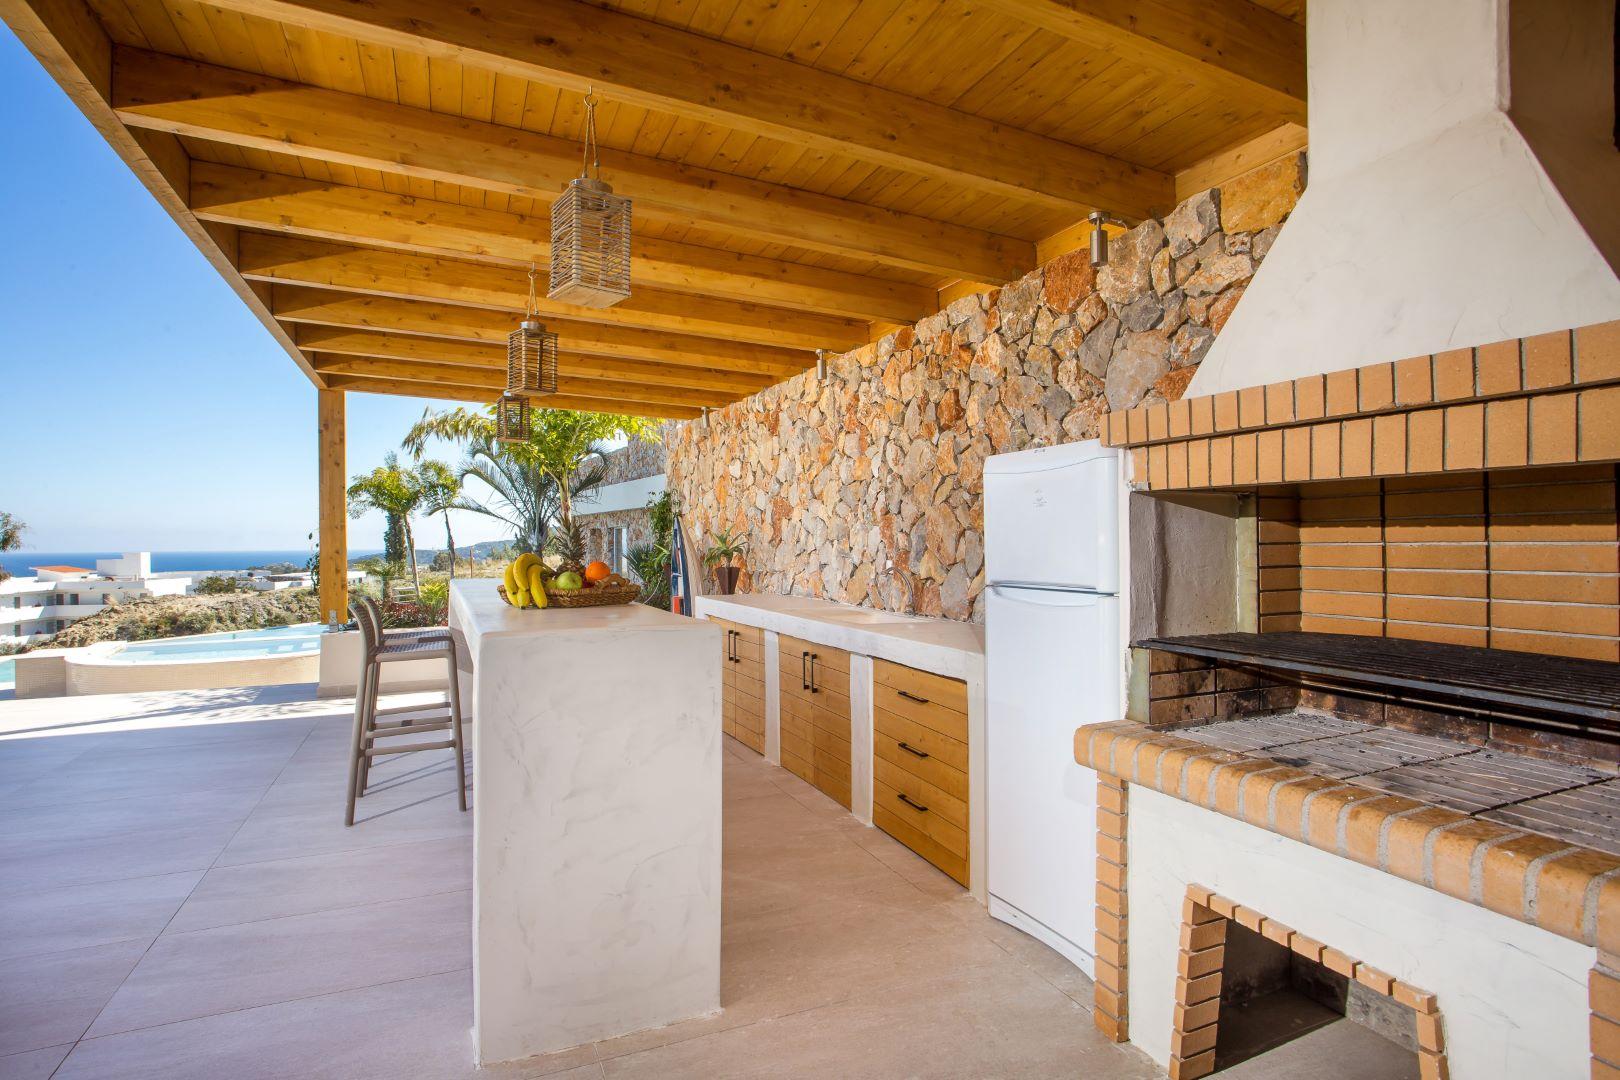 Venezia-Luxury-Living-villas-at-Faliraki-Rhodes-Greece-10